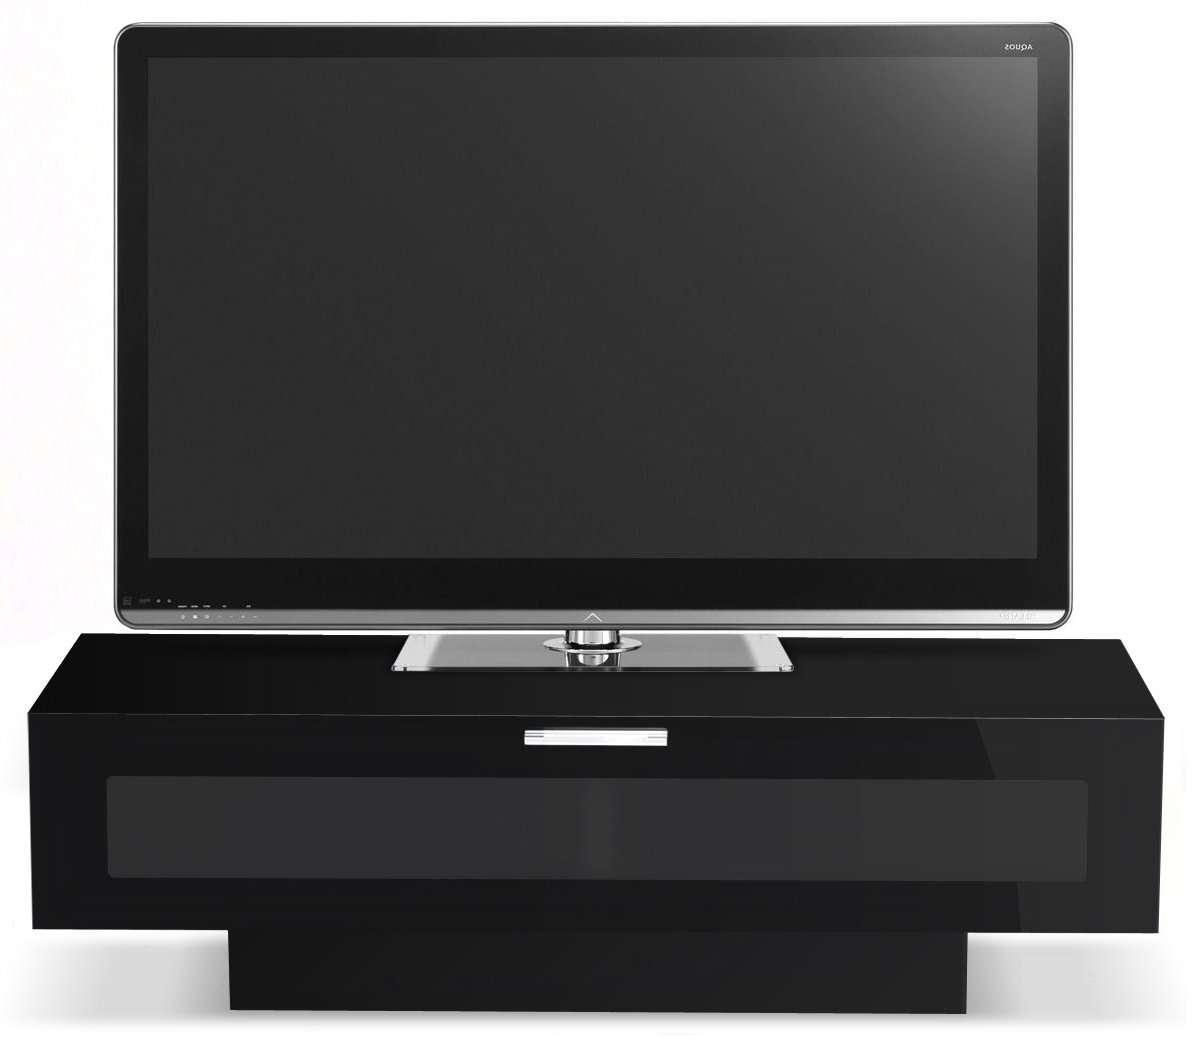 Stil Stand Stuk 4001 Bl – 1 Tv Stands Throughout Stil Tv Stands (View 12 of 20)